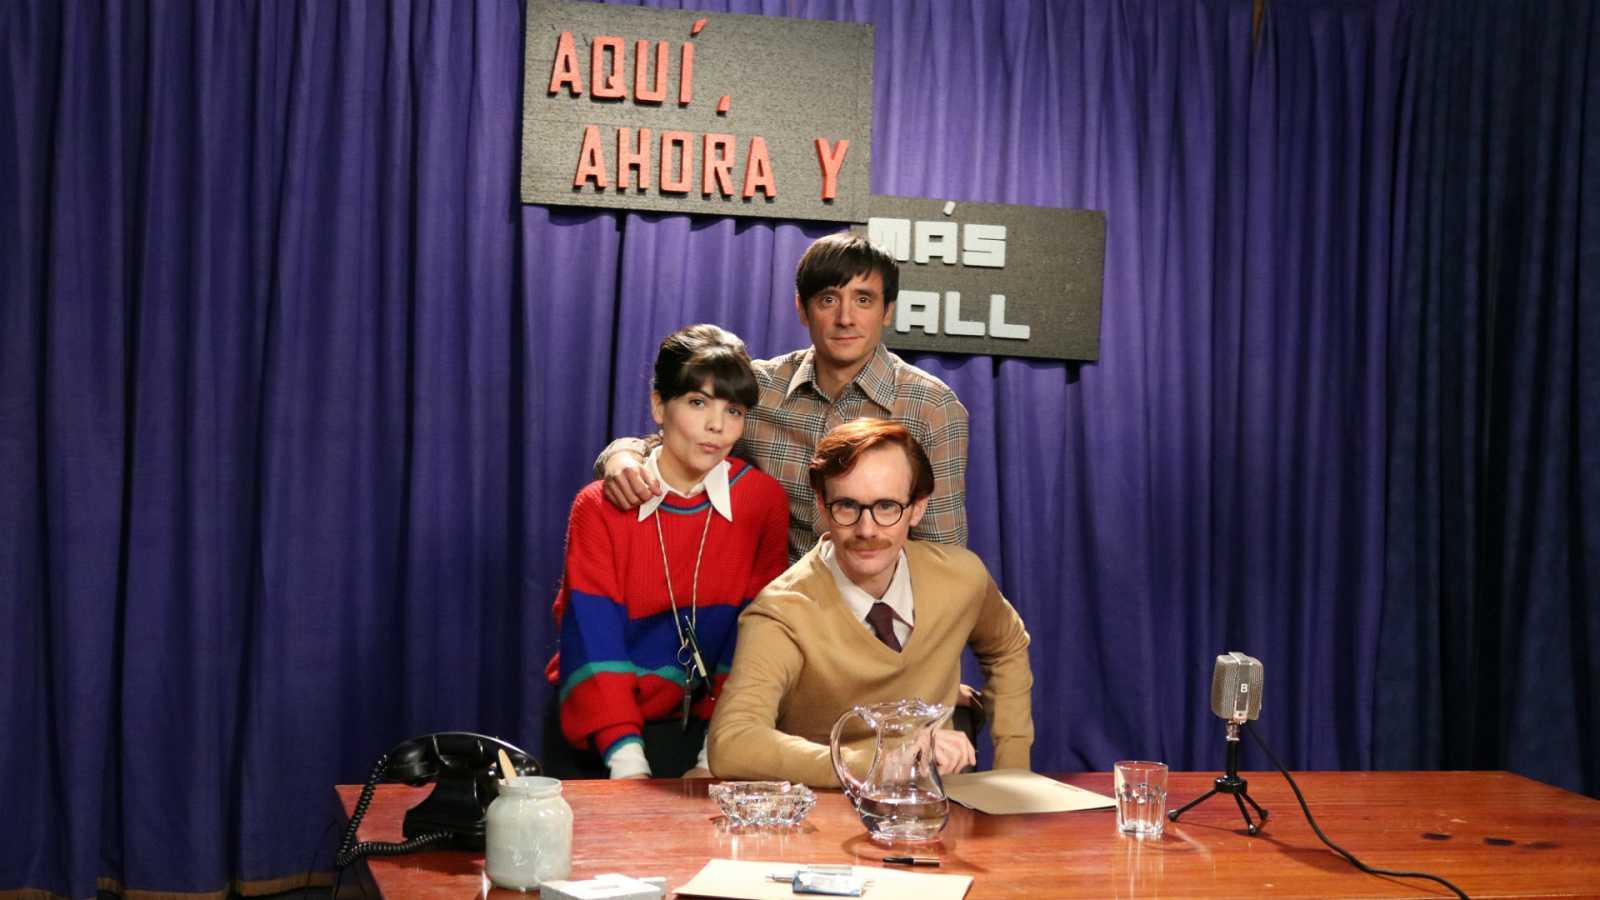 Agnés Llobet (Lola), Daniel Pérez Prada (Anibal) e Ignacio Mateos (Aparicio), en el plató del nuevo programa de misterio